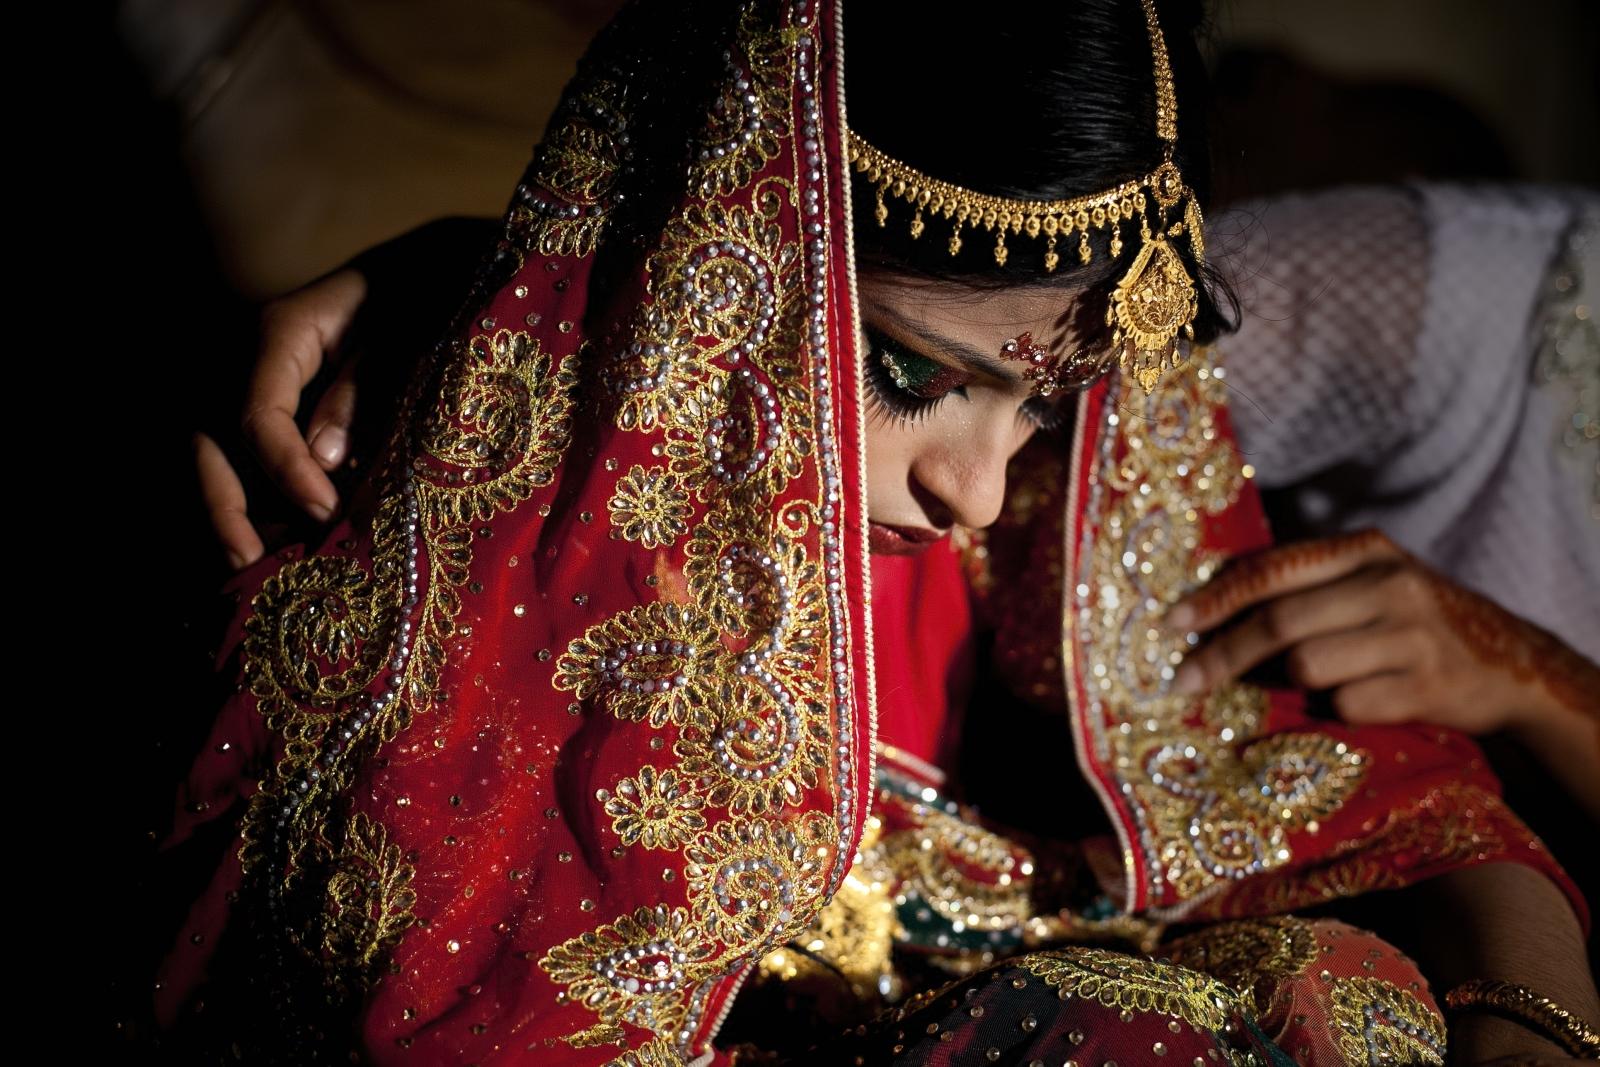 Bangladesh child marriage law